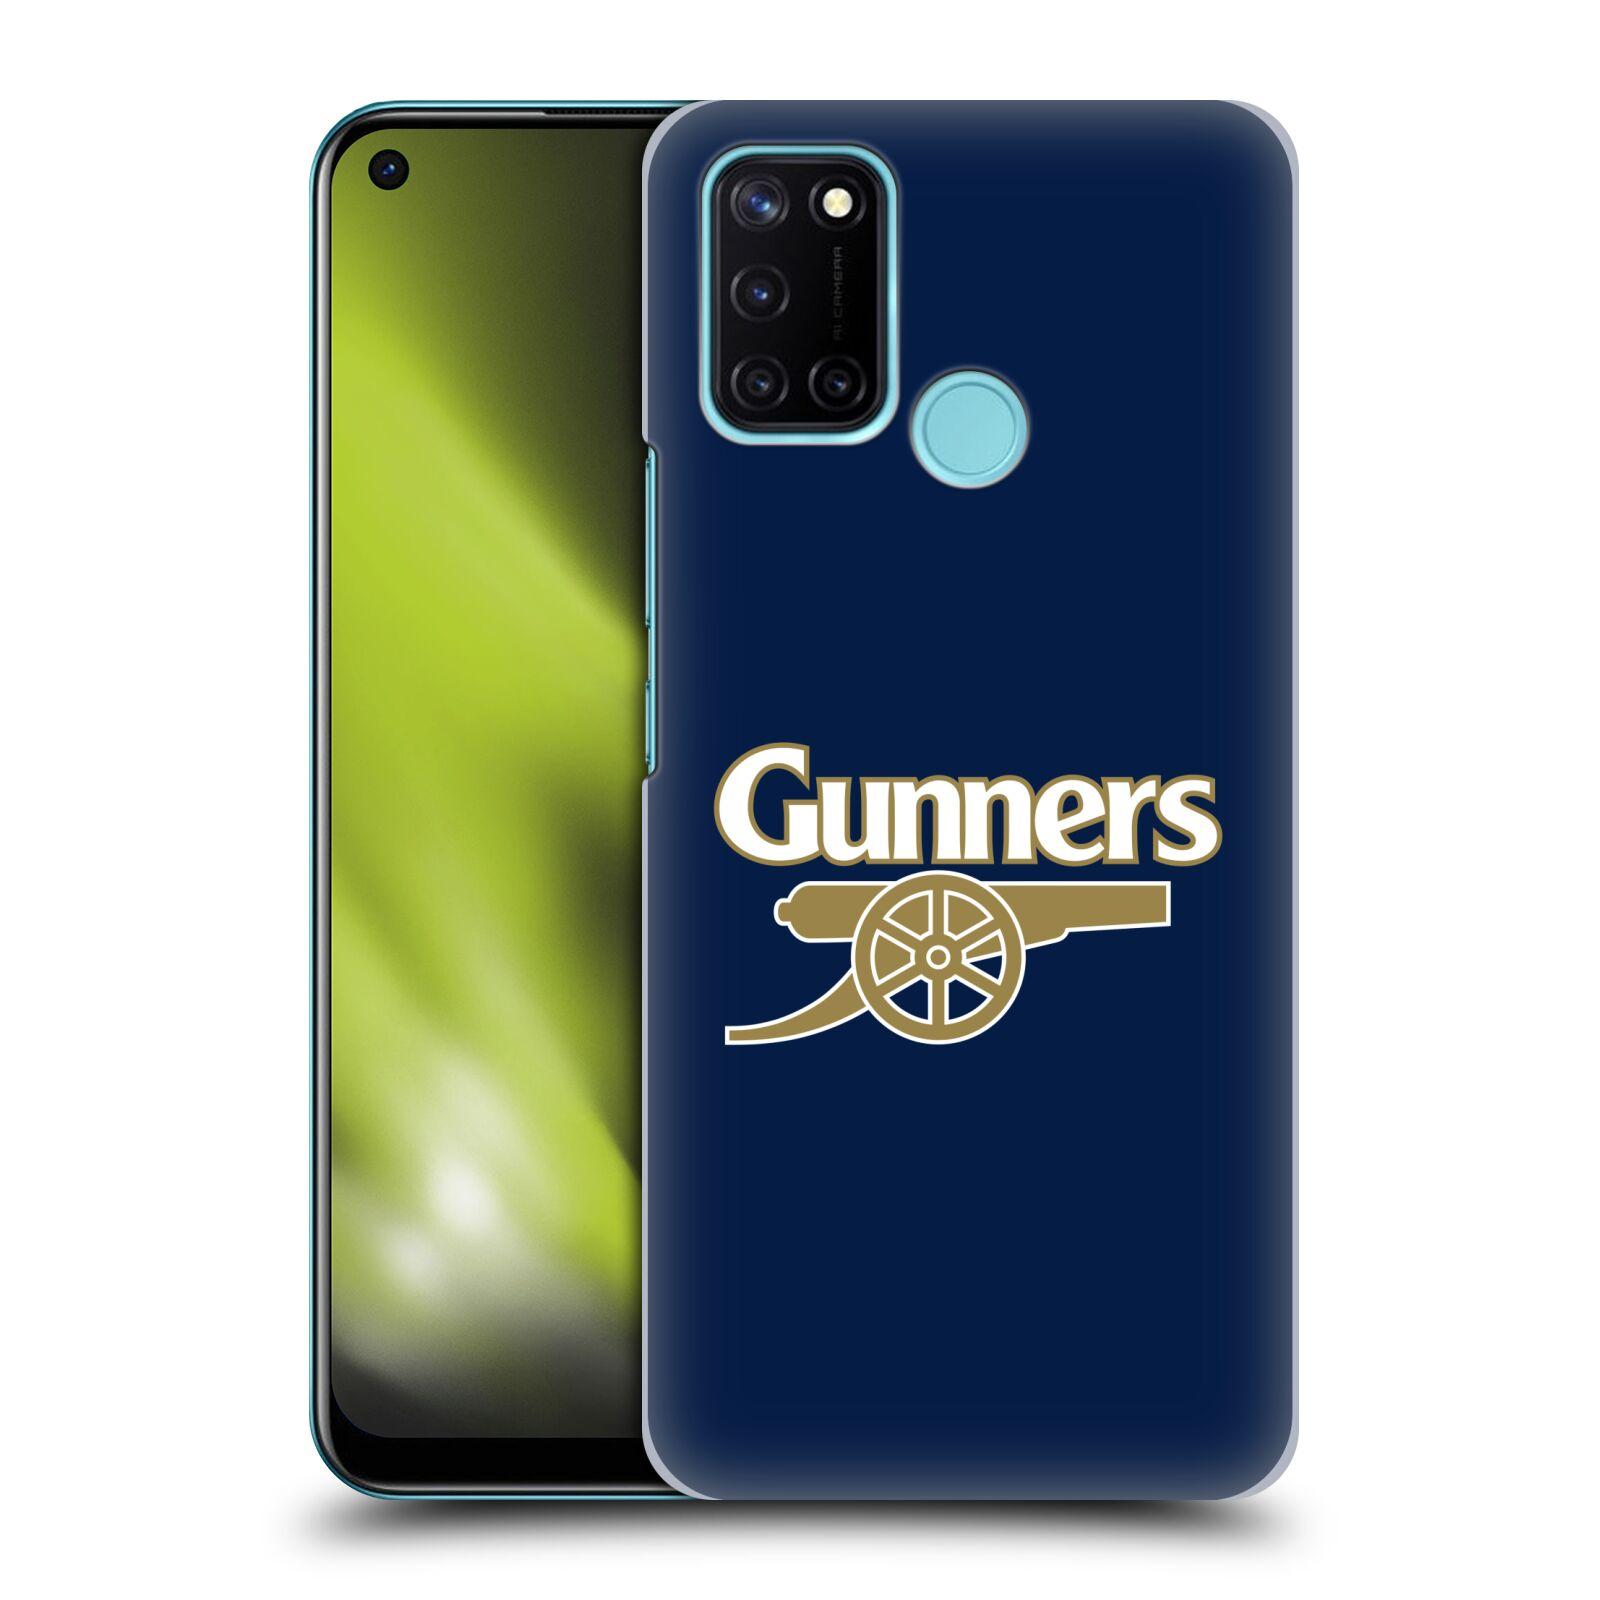 Plastové pouzdro na mobil Realme 7i - Head Case - Arsenal FC - Gunners